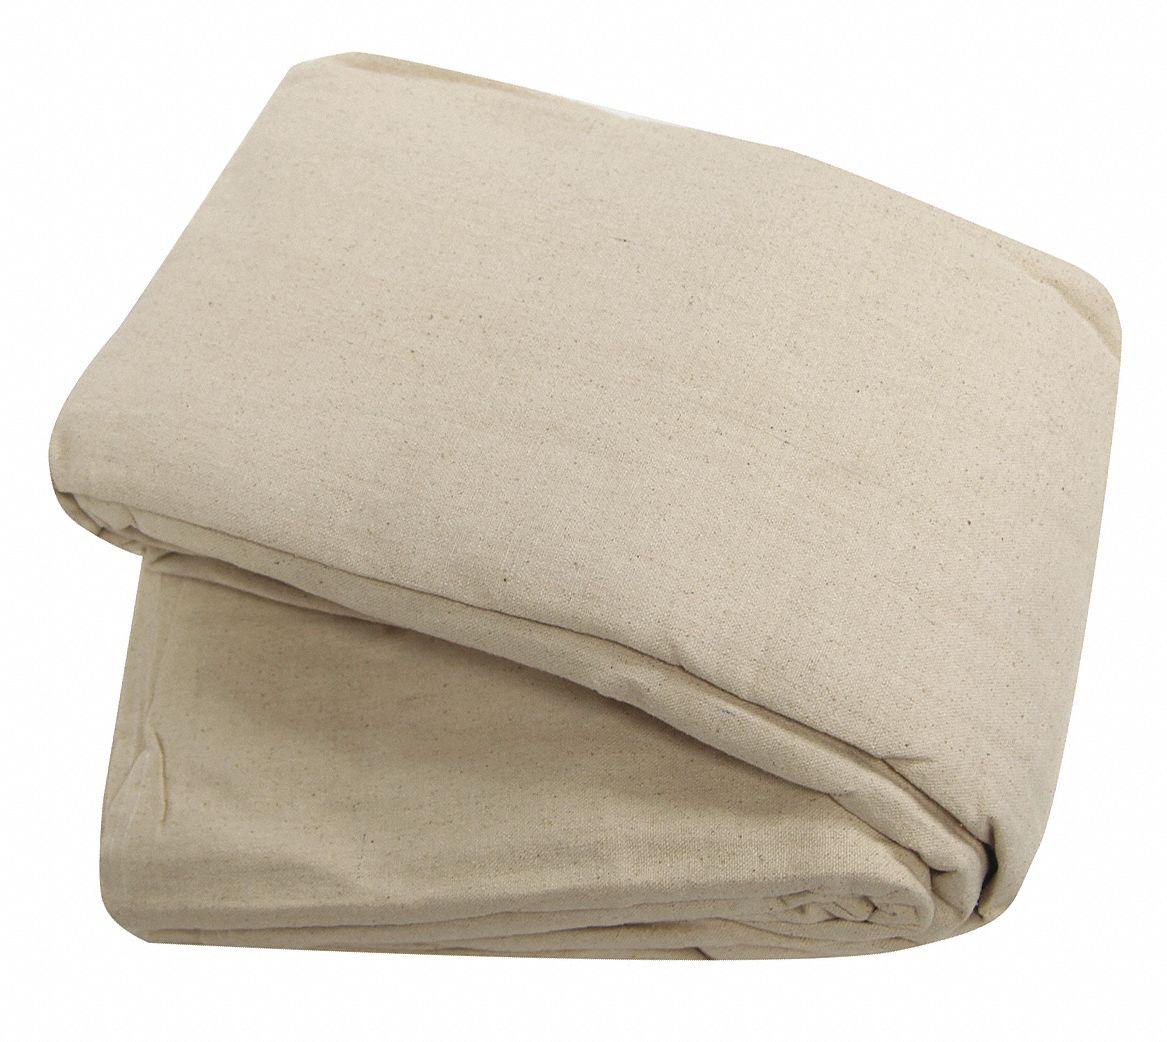 Grainger Approved Canvas Drop Cloth 5h909 58903gr Grainger